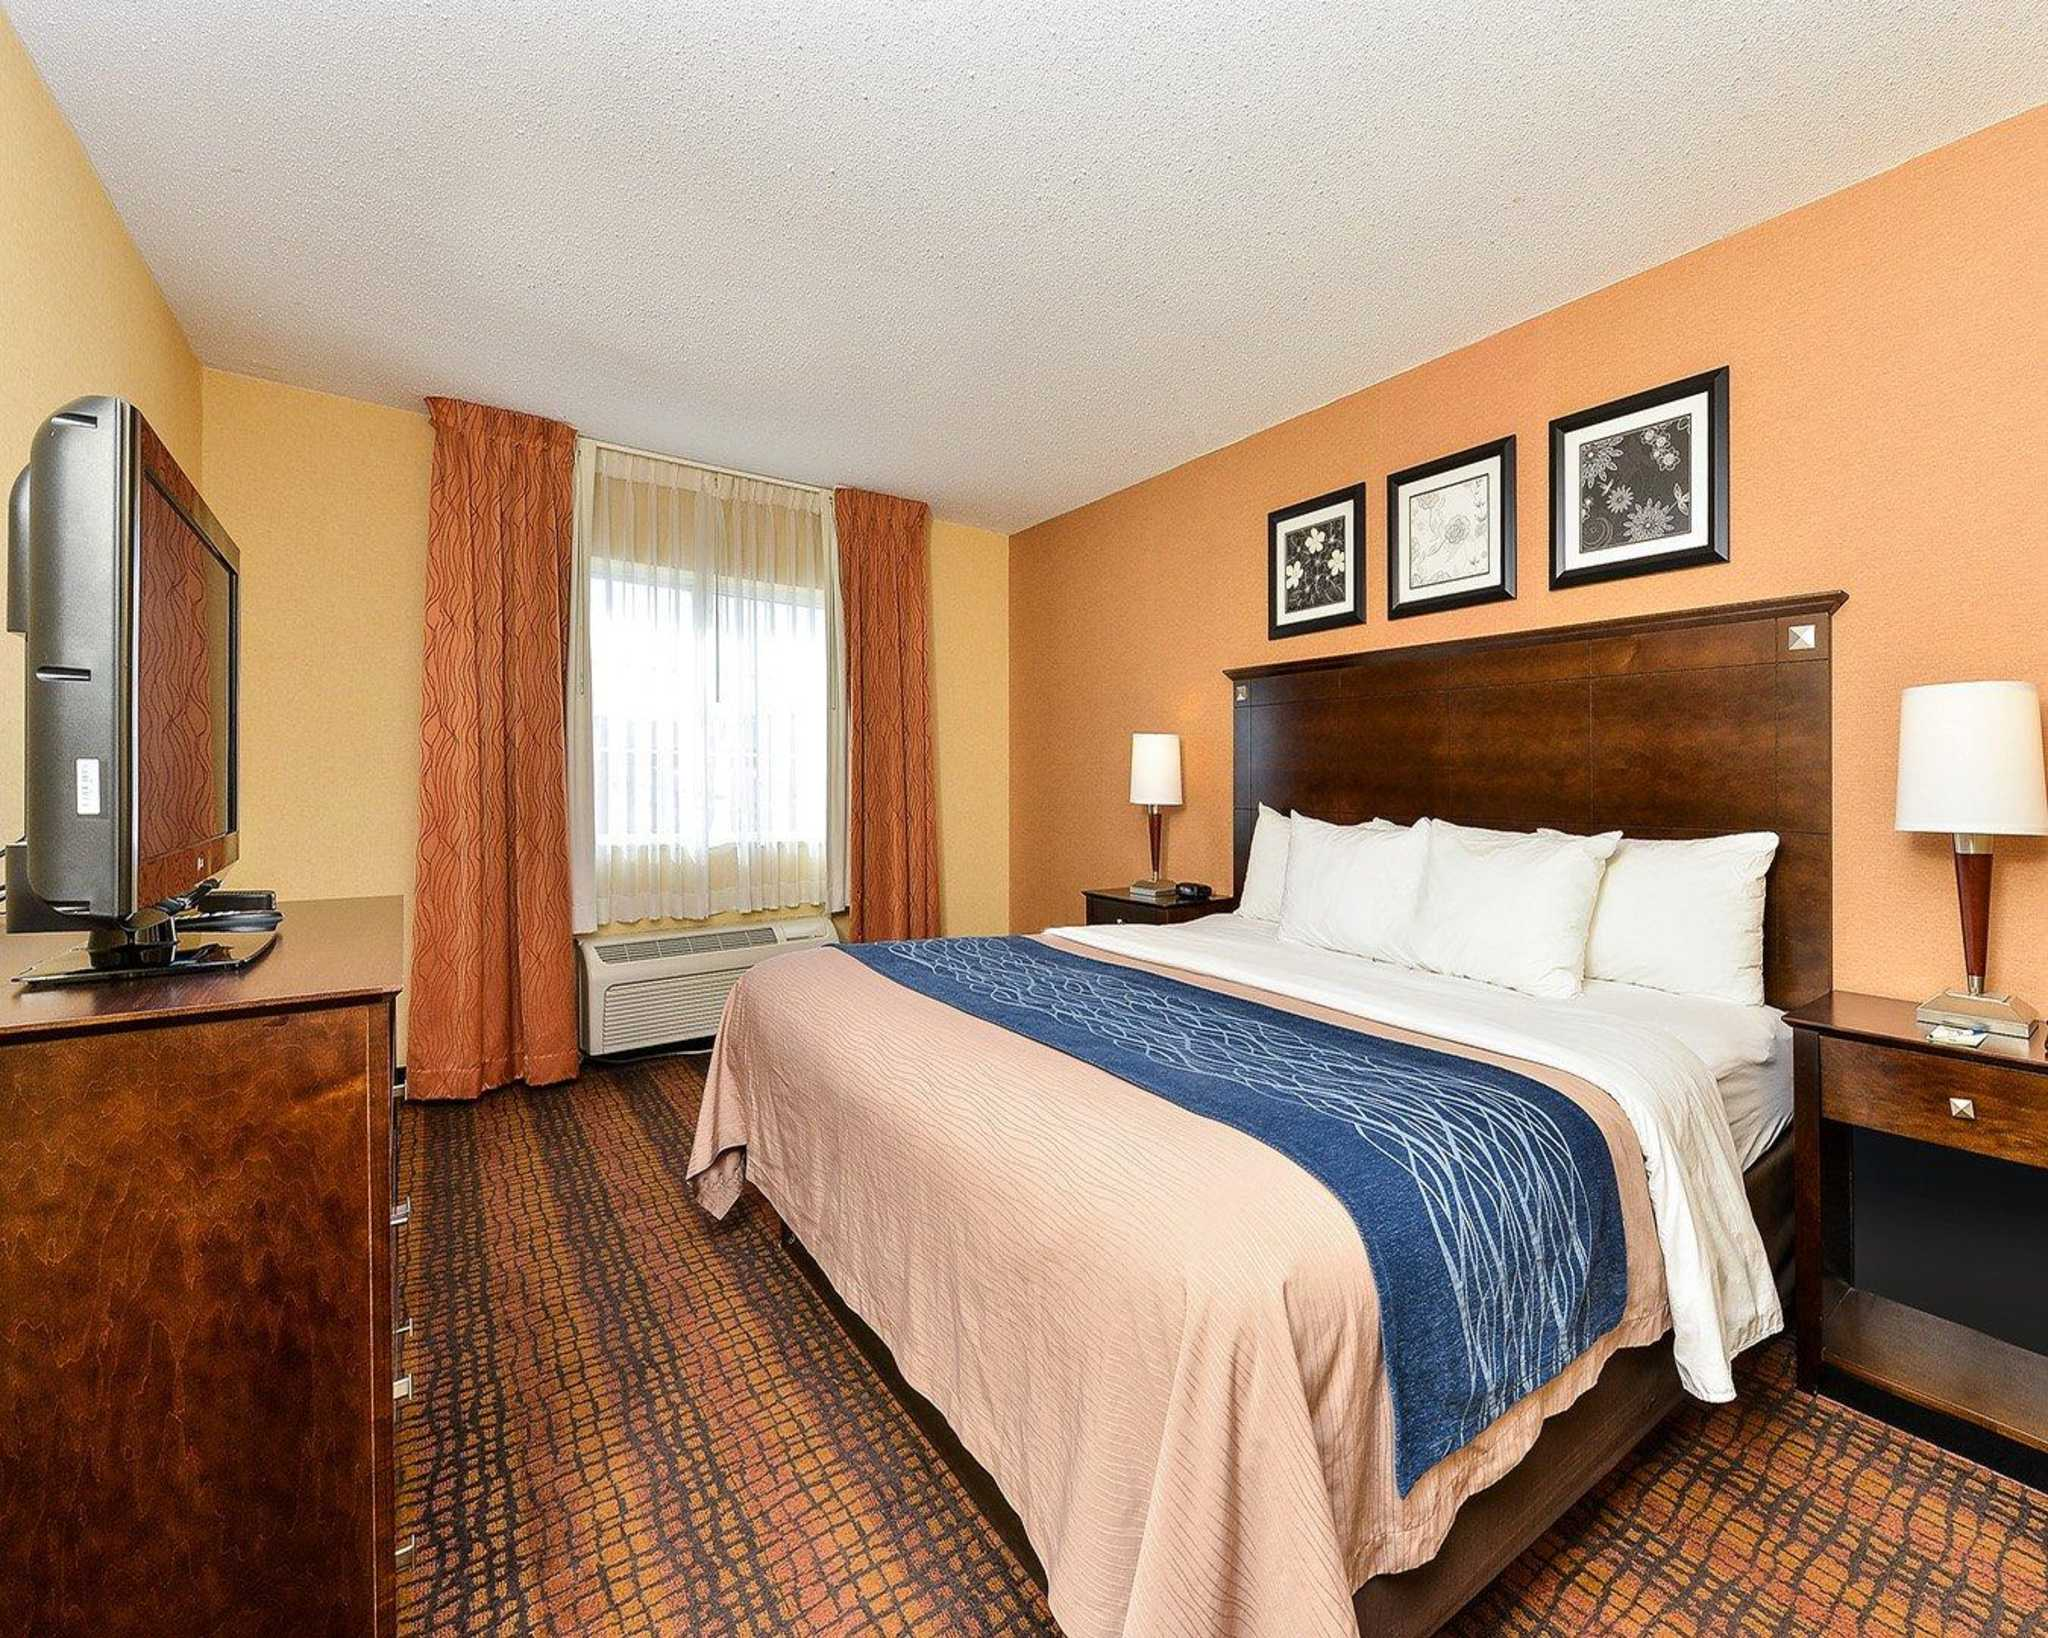 Quality Suites image 5